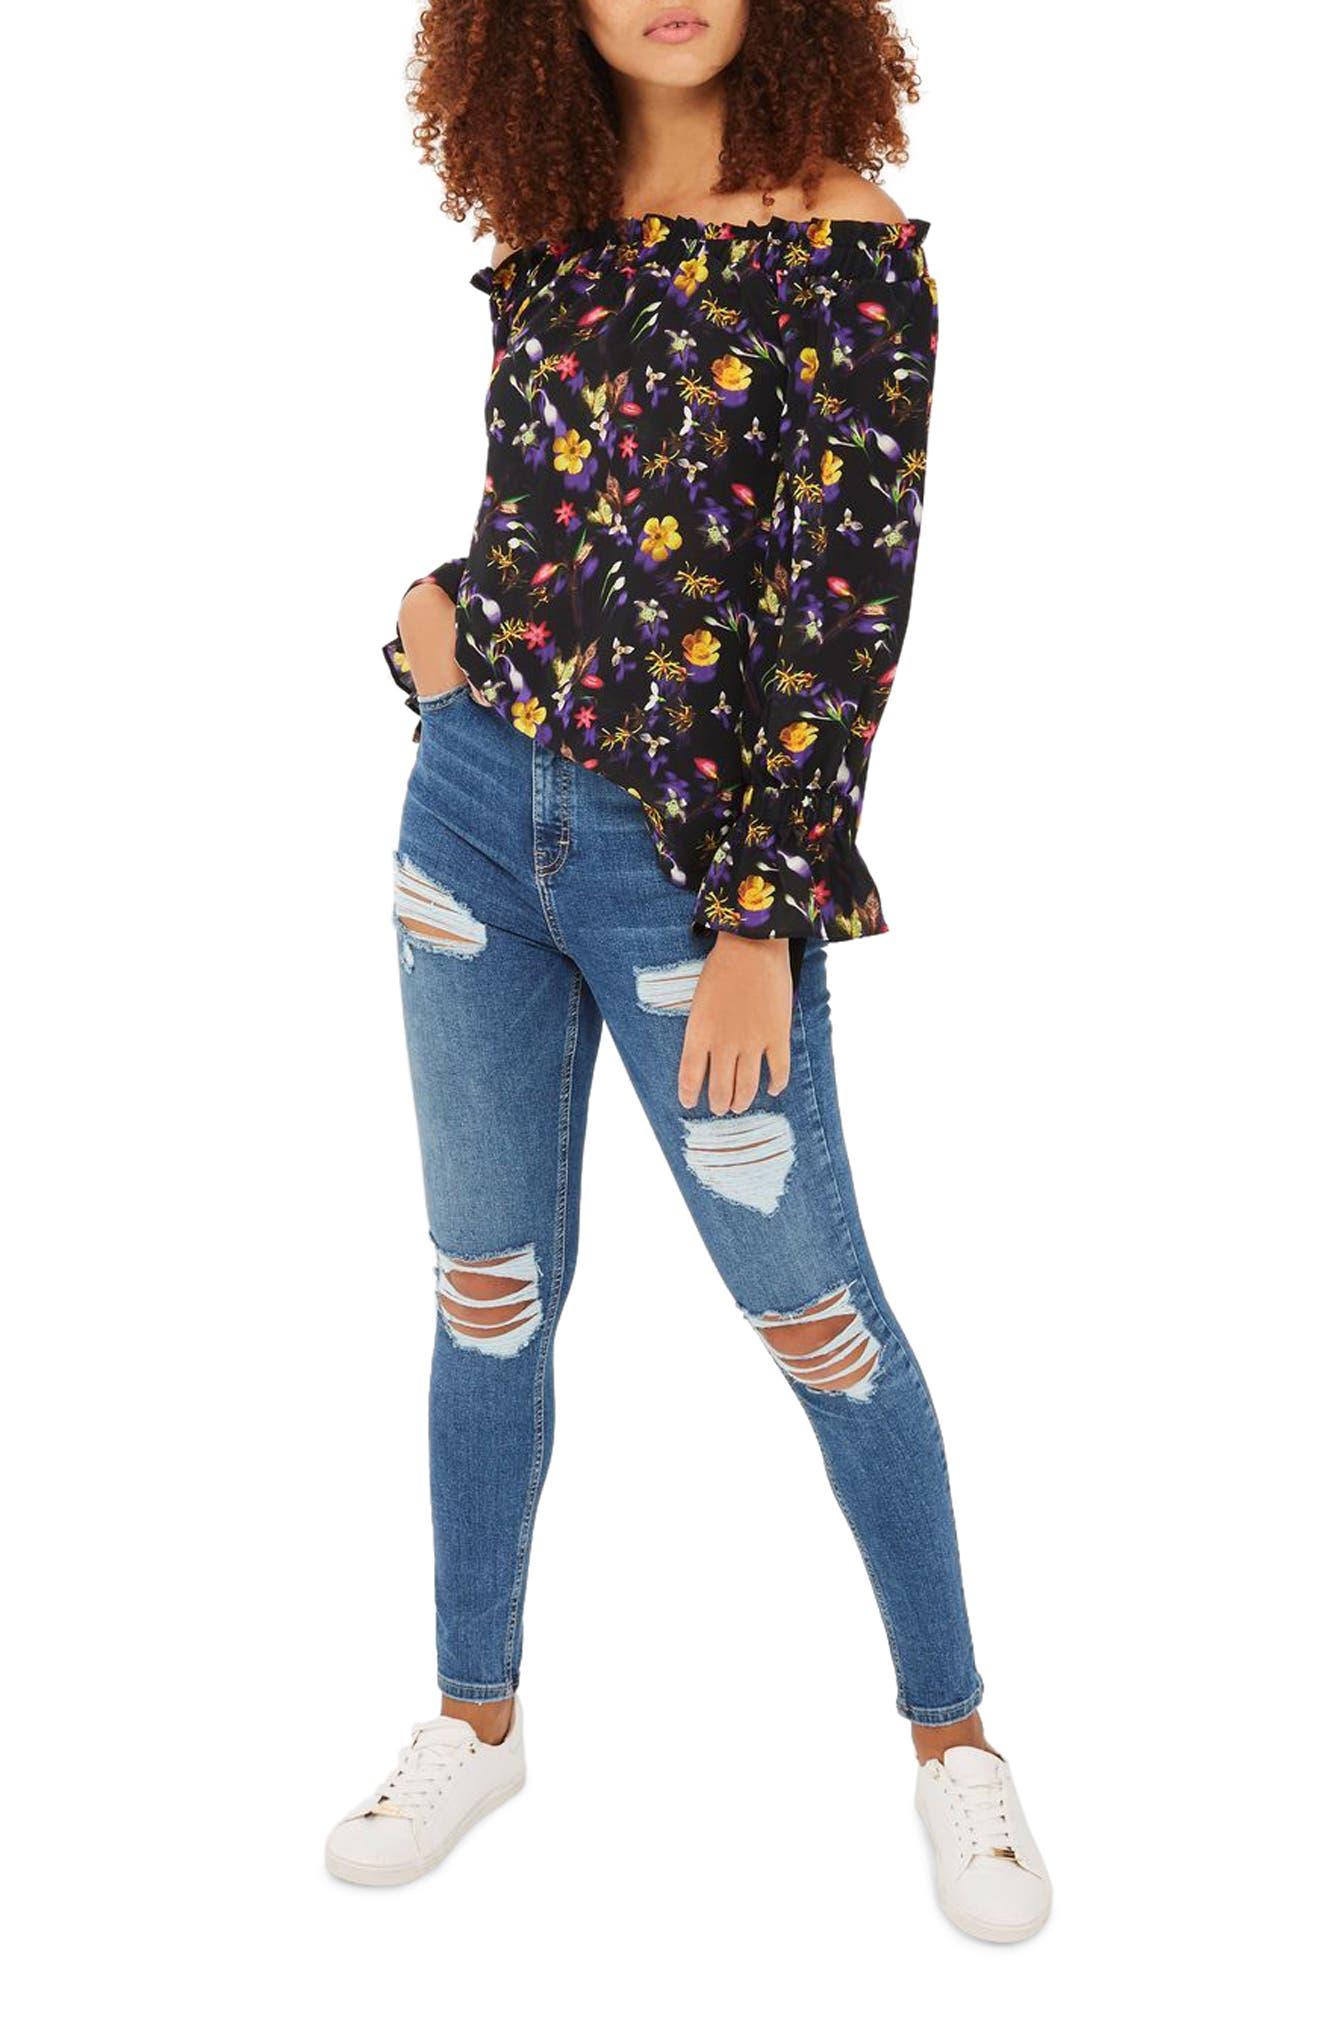 TOPSHOP Floral Tie Sleeve Off-the-Shoulder Top